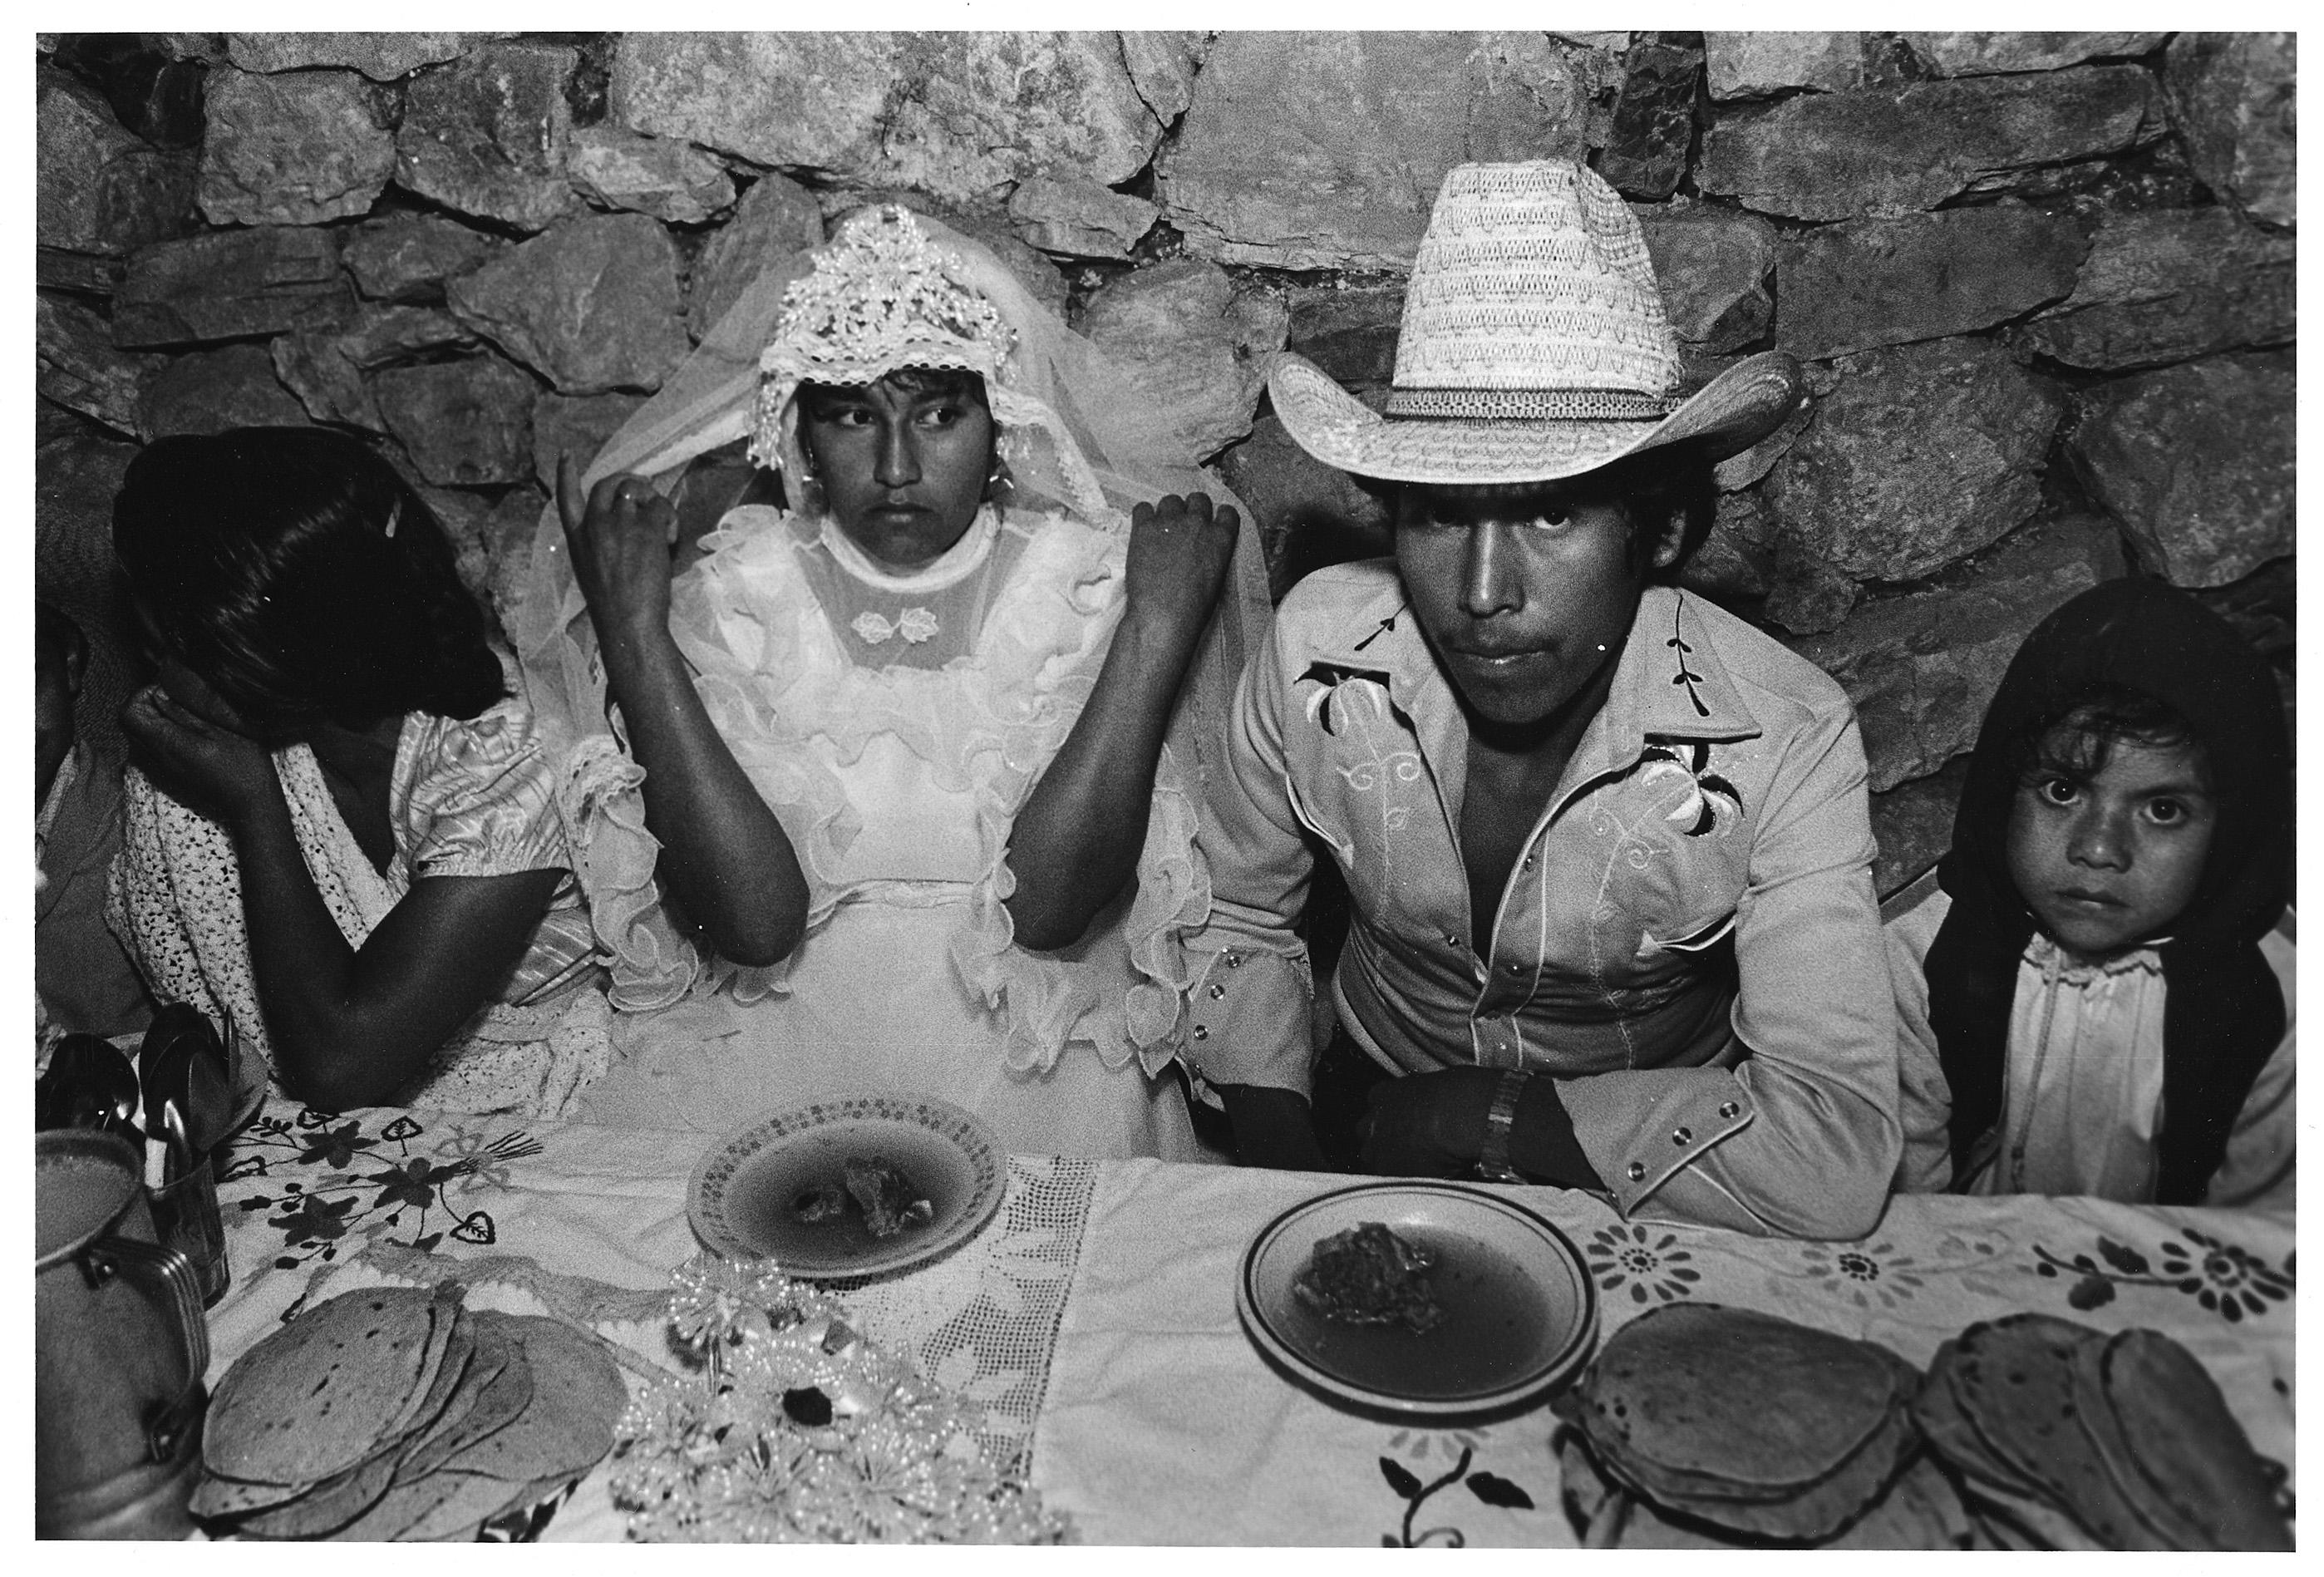 Photo_Wedding_Rural_Queretero_1985_Phil_Decker_Congressional_Hispanic_Caucus_RG233_001